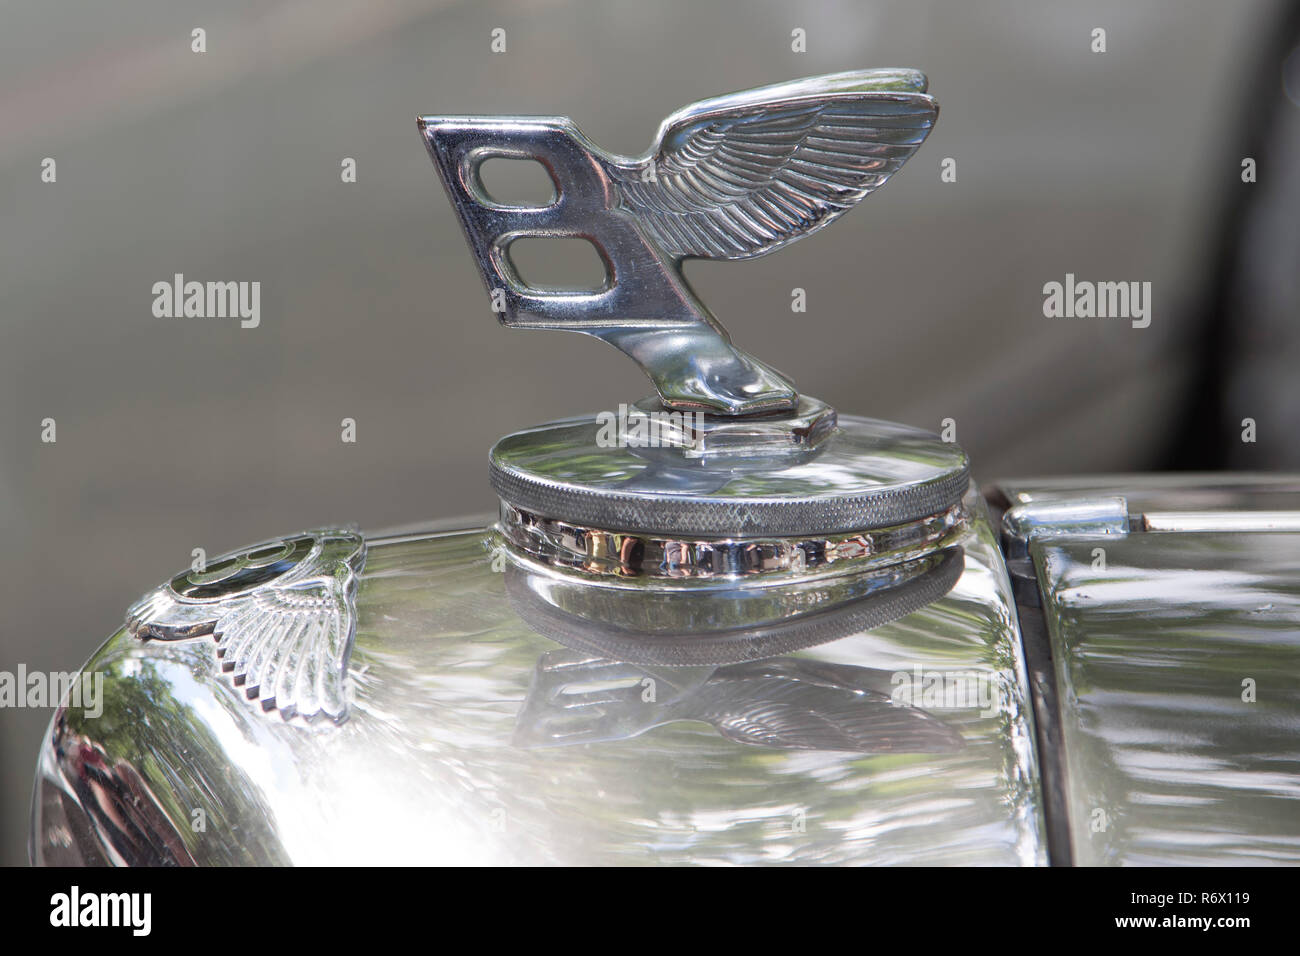 Bentley winged 'B' badge bonnet (hood) ornament - Stock Image